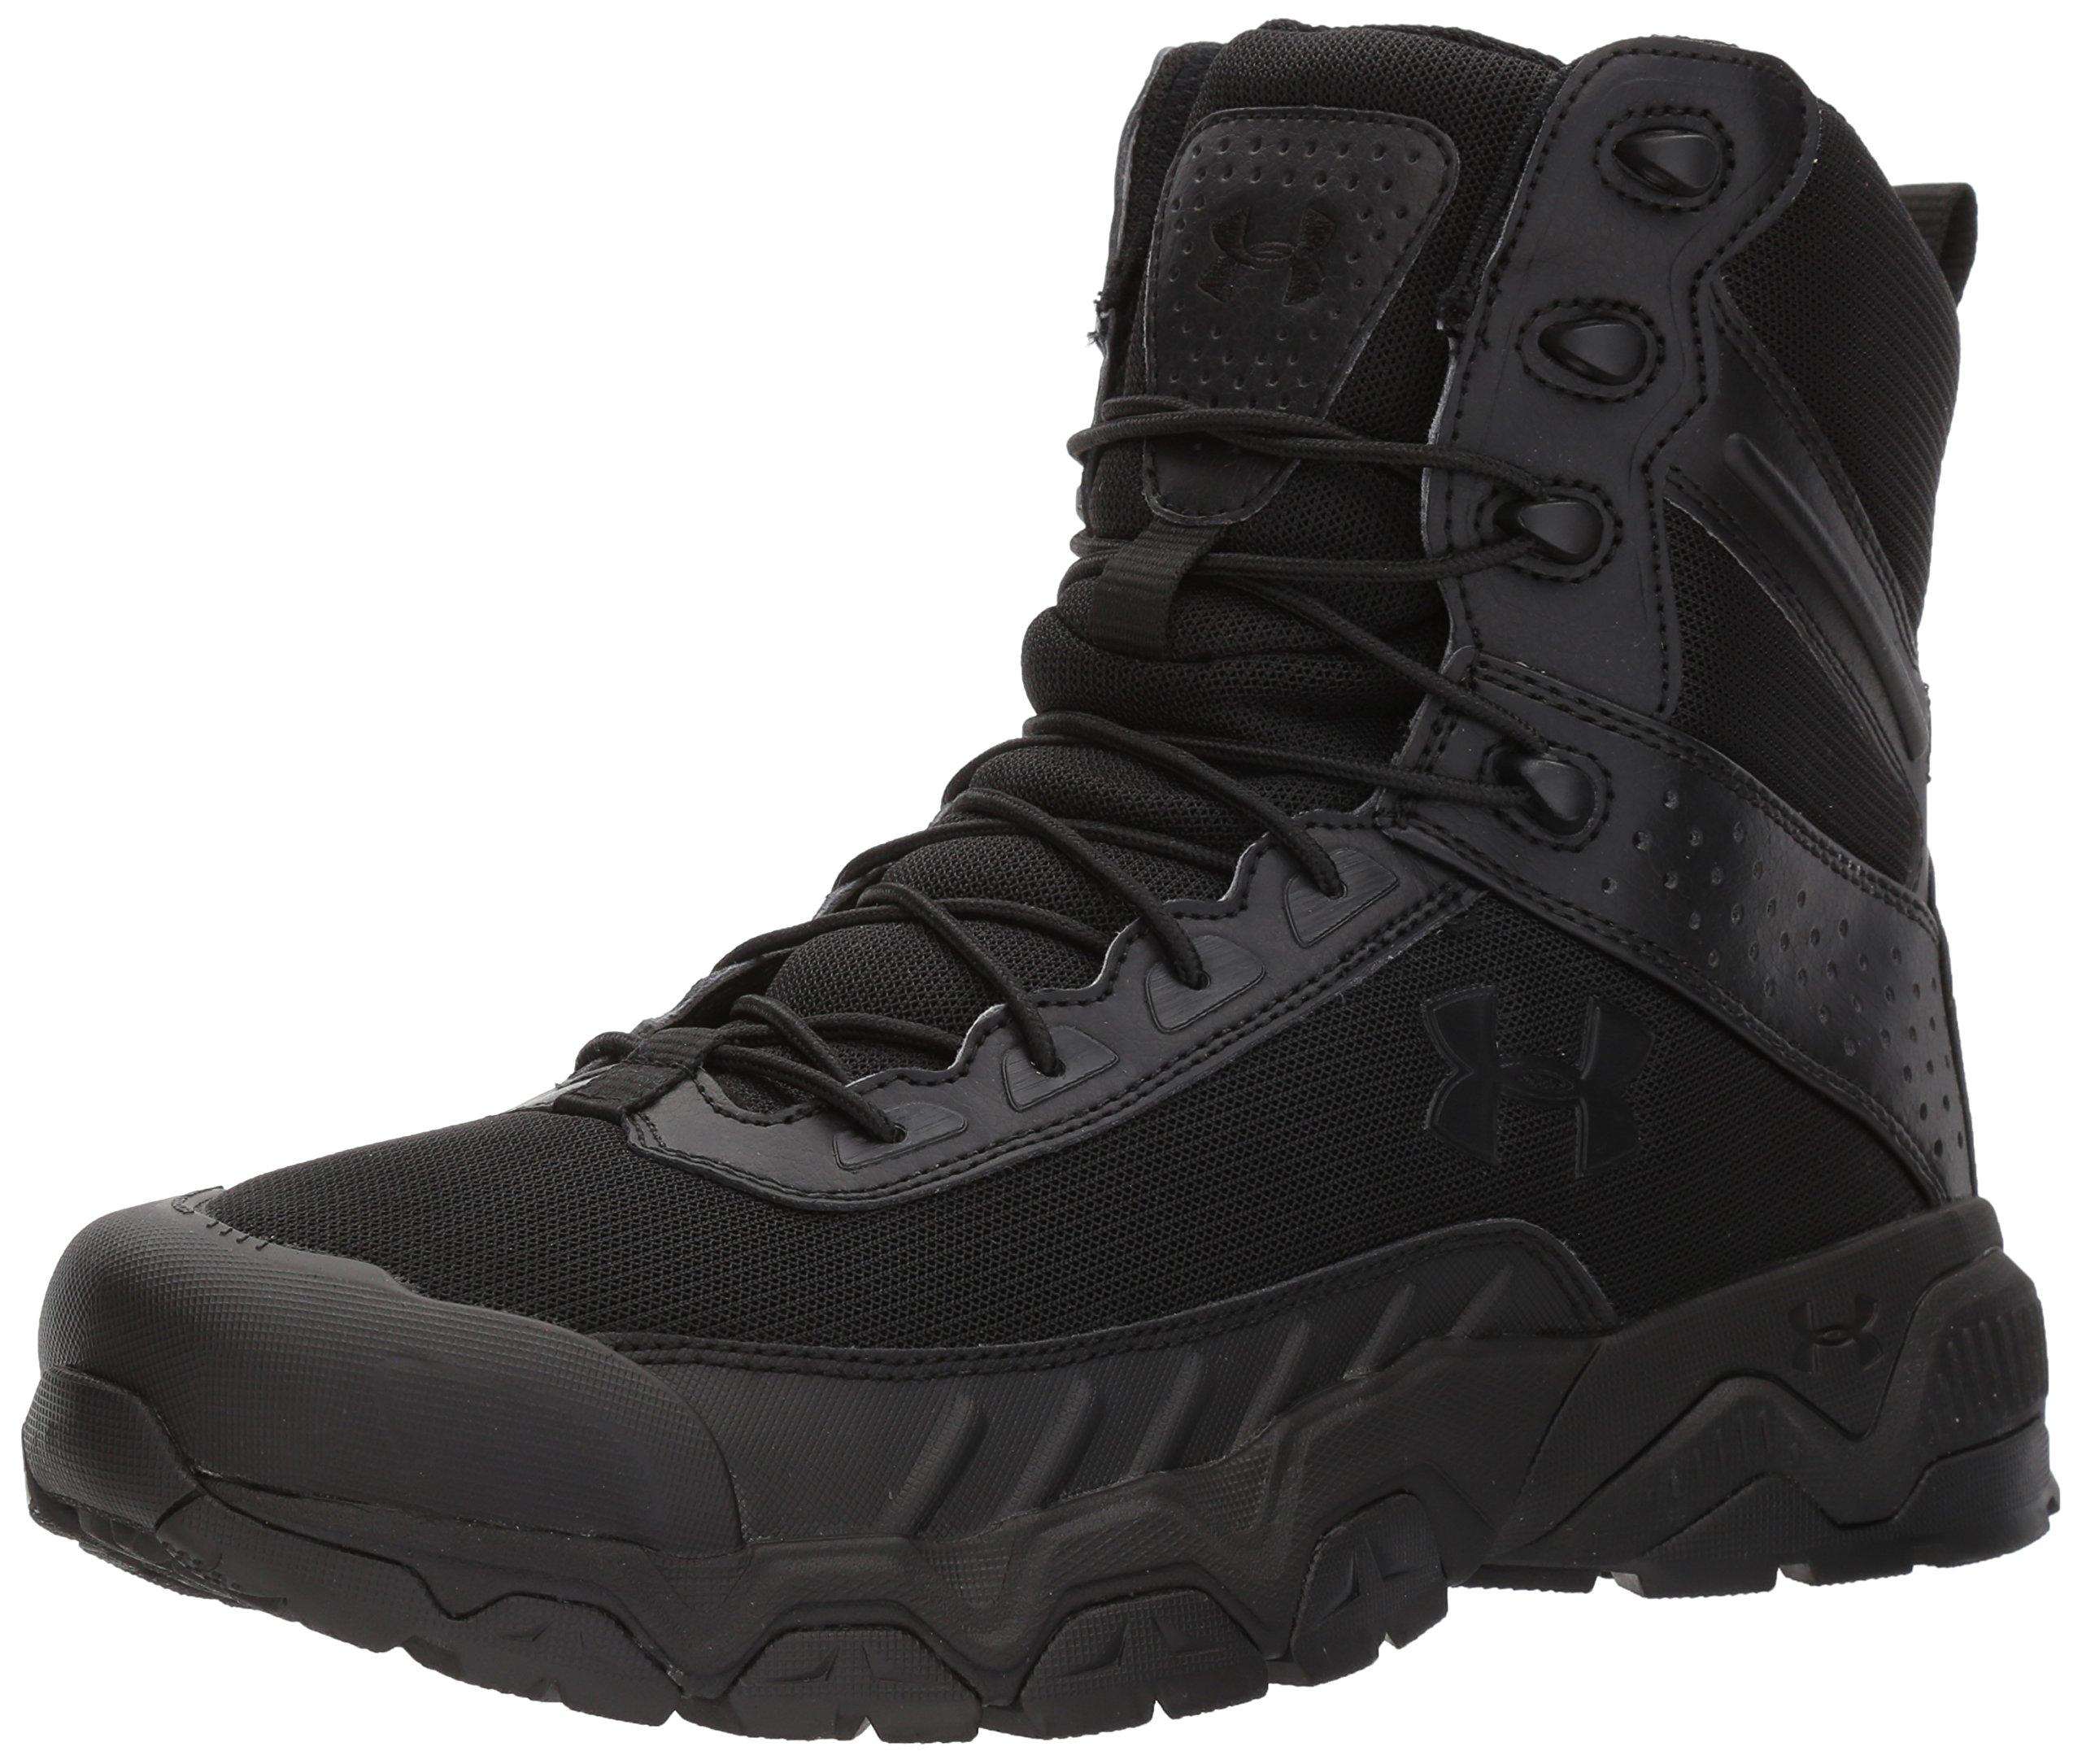 Under Armour Men's Valsetz Military & Tactical Boot Military and Tactical, Black (001)/Black, 11 by Under Armour